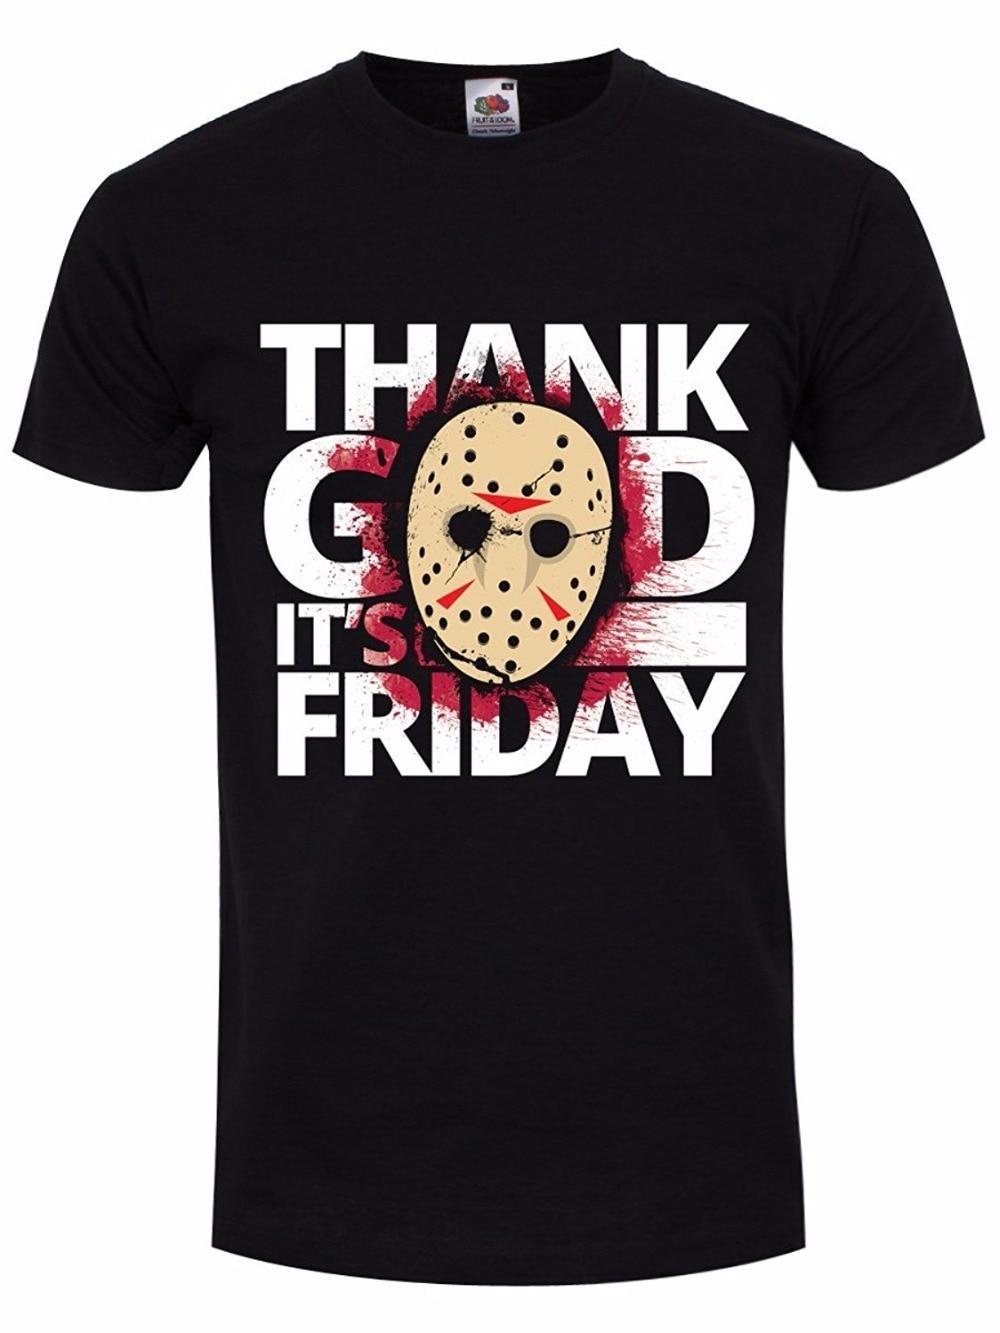 Clothing Plus Size S M L Xl XXl O-Neck Short Mens Thank God Its Friday T-Shirt Black 100% Cotton Mens Tee